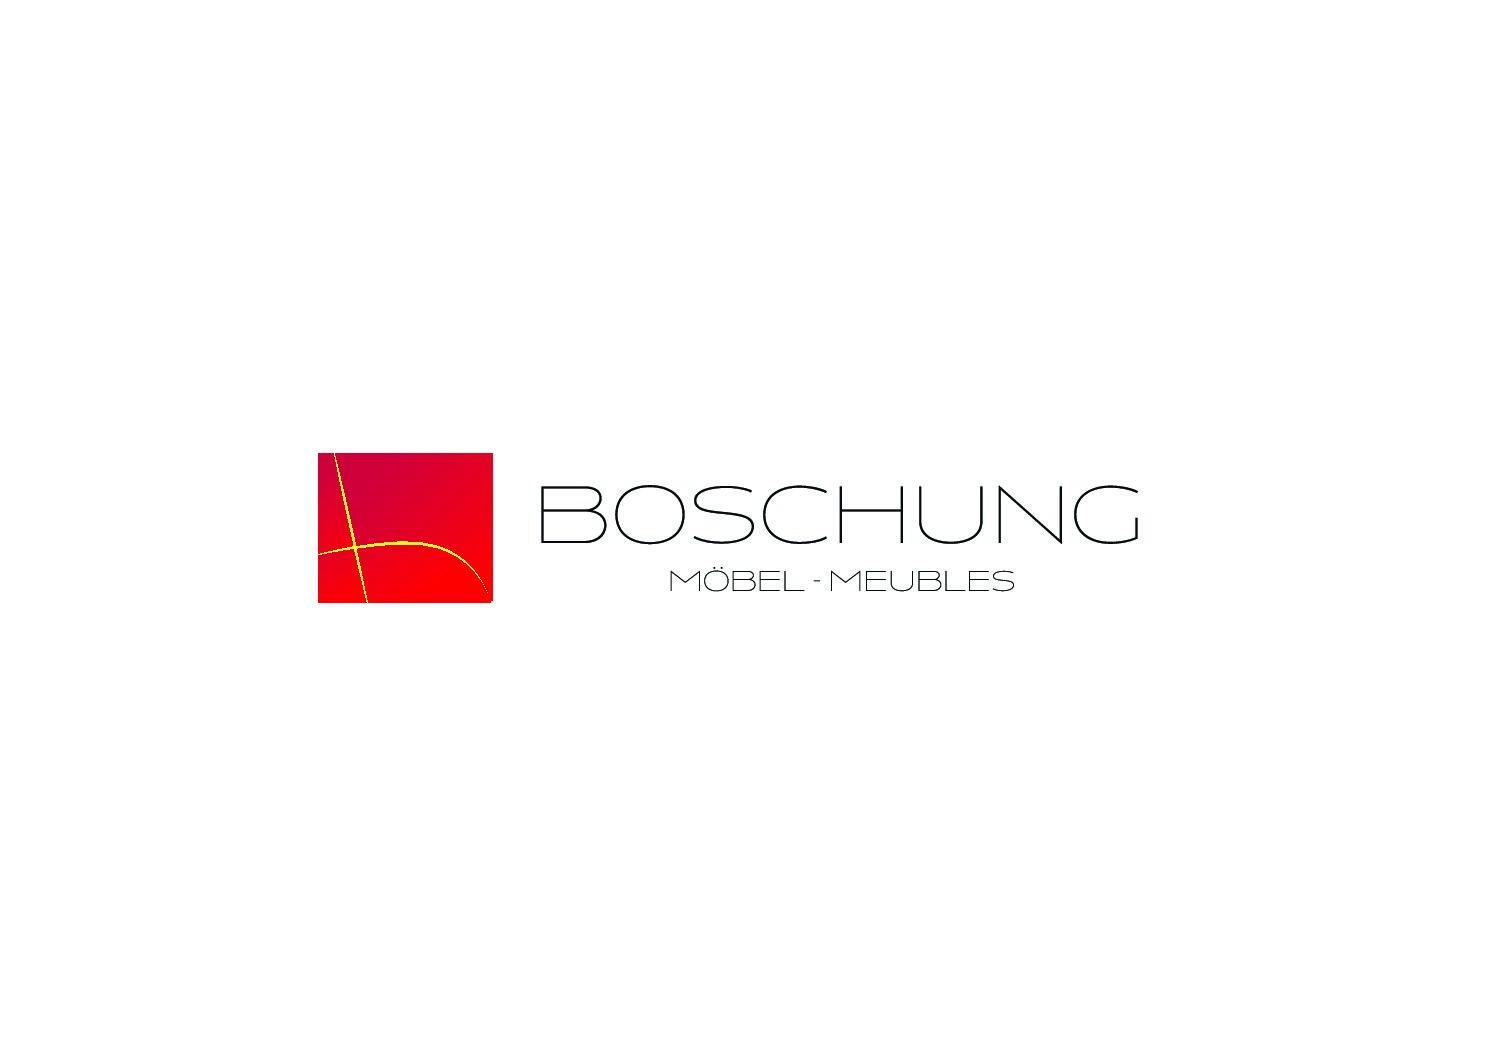 https://www.fcrichemond.ch/wp-content/uploads/2021/07/Annonce-Meubles-Boschung-pdf.jpg